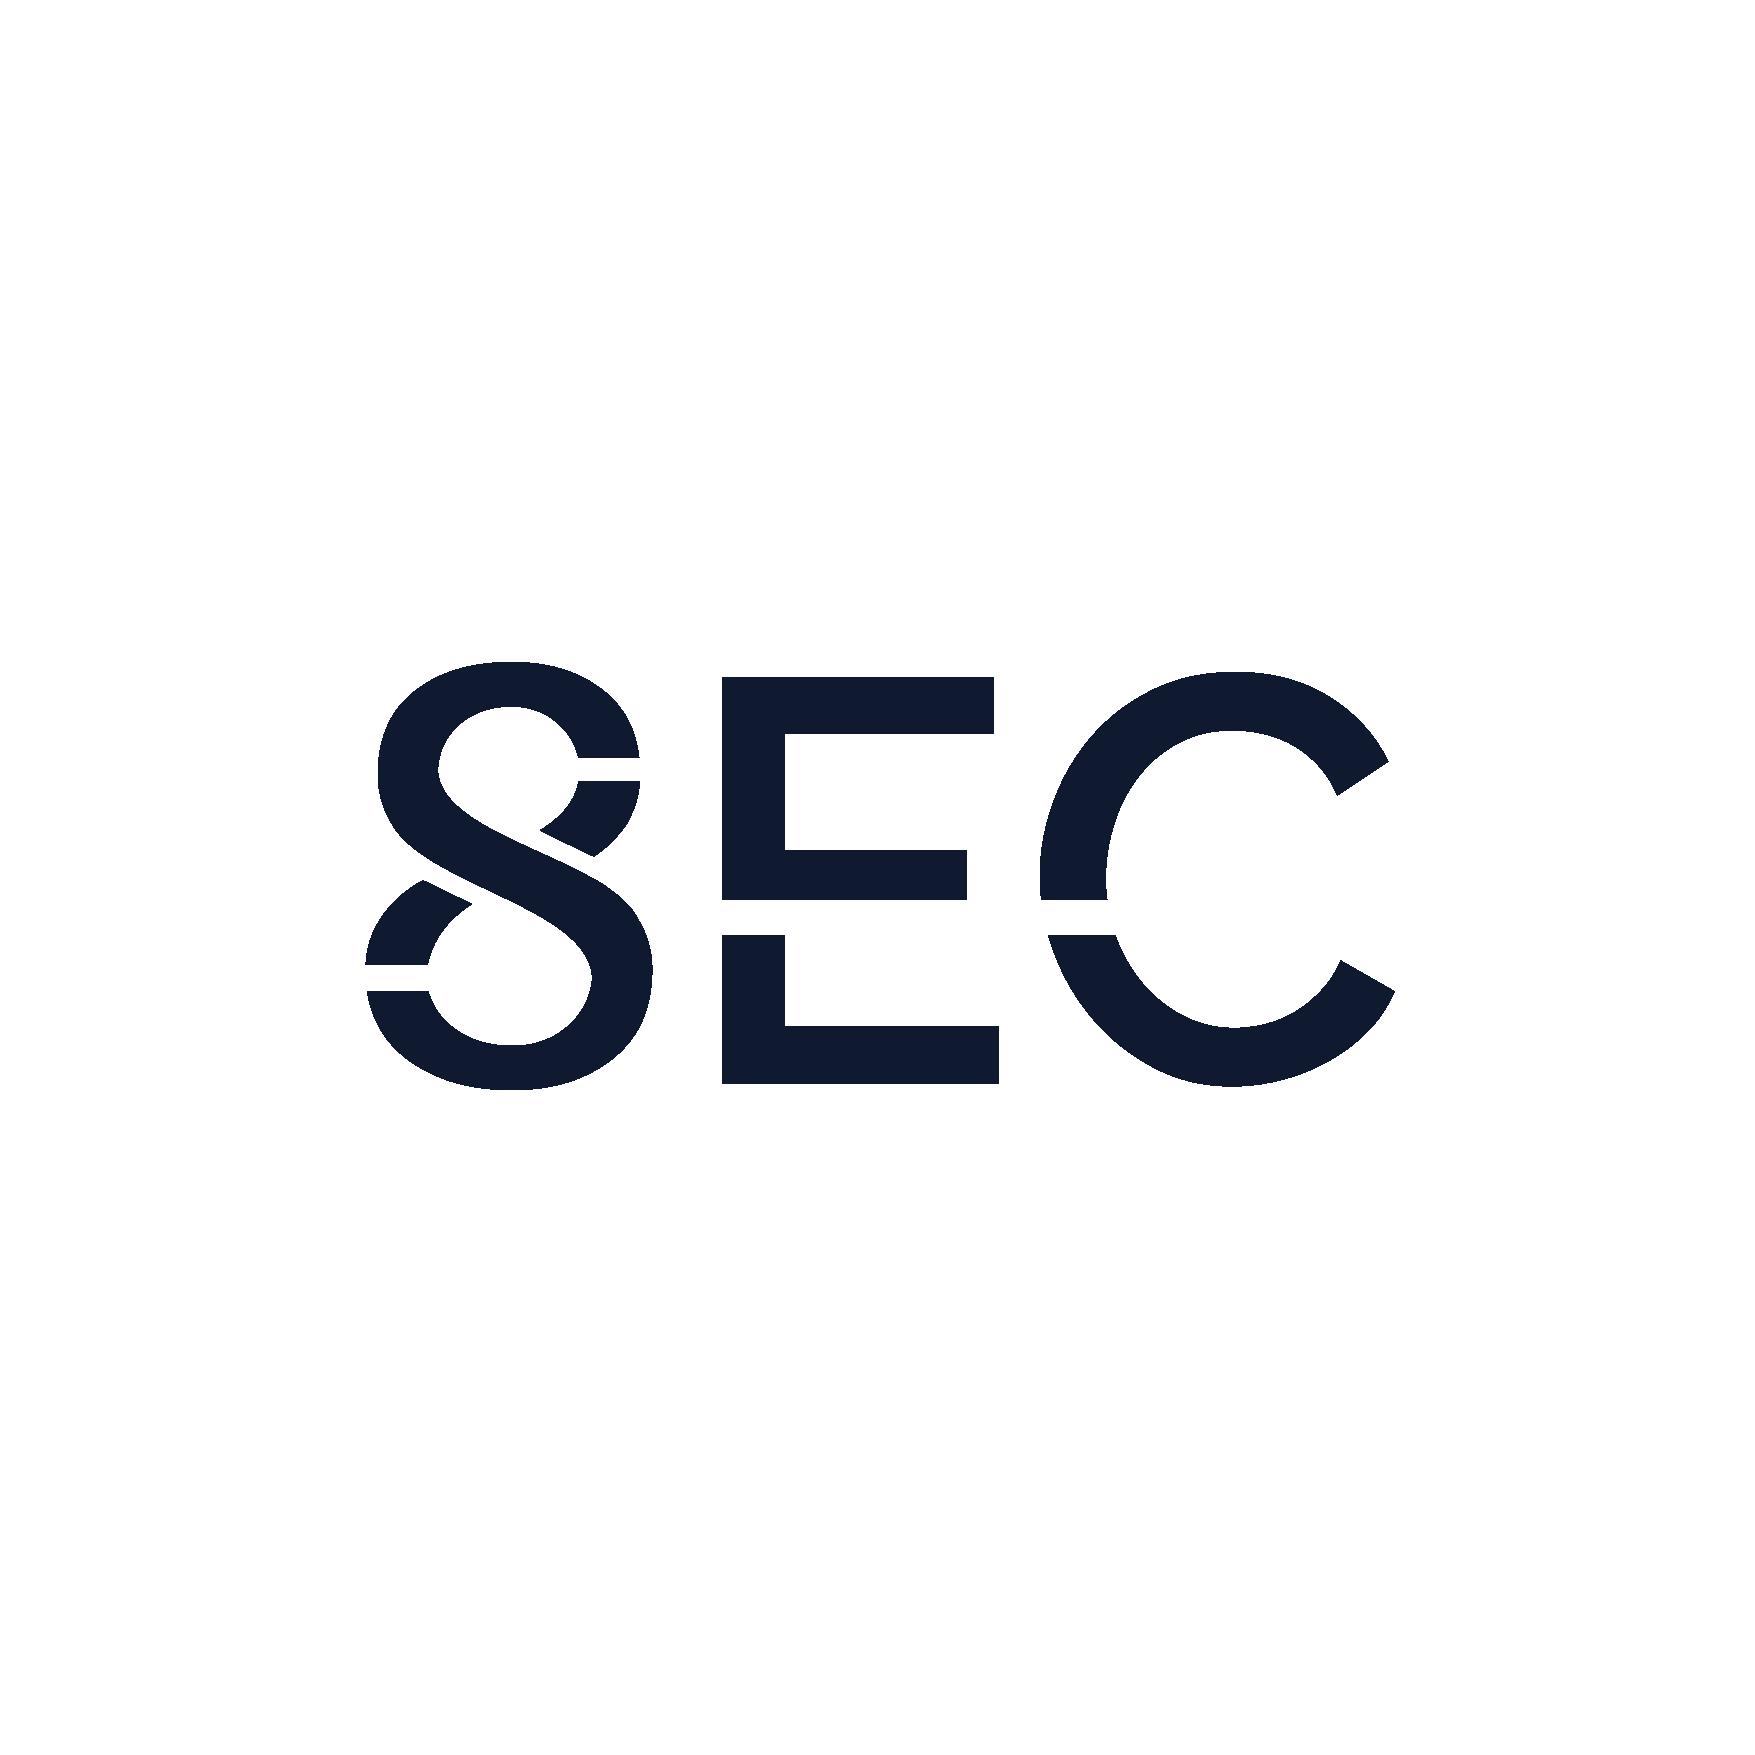 8Sec logo